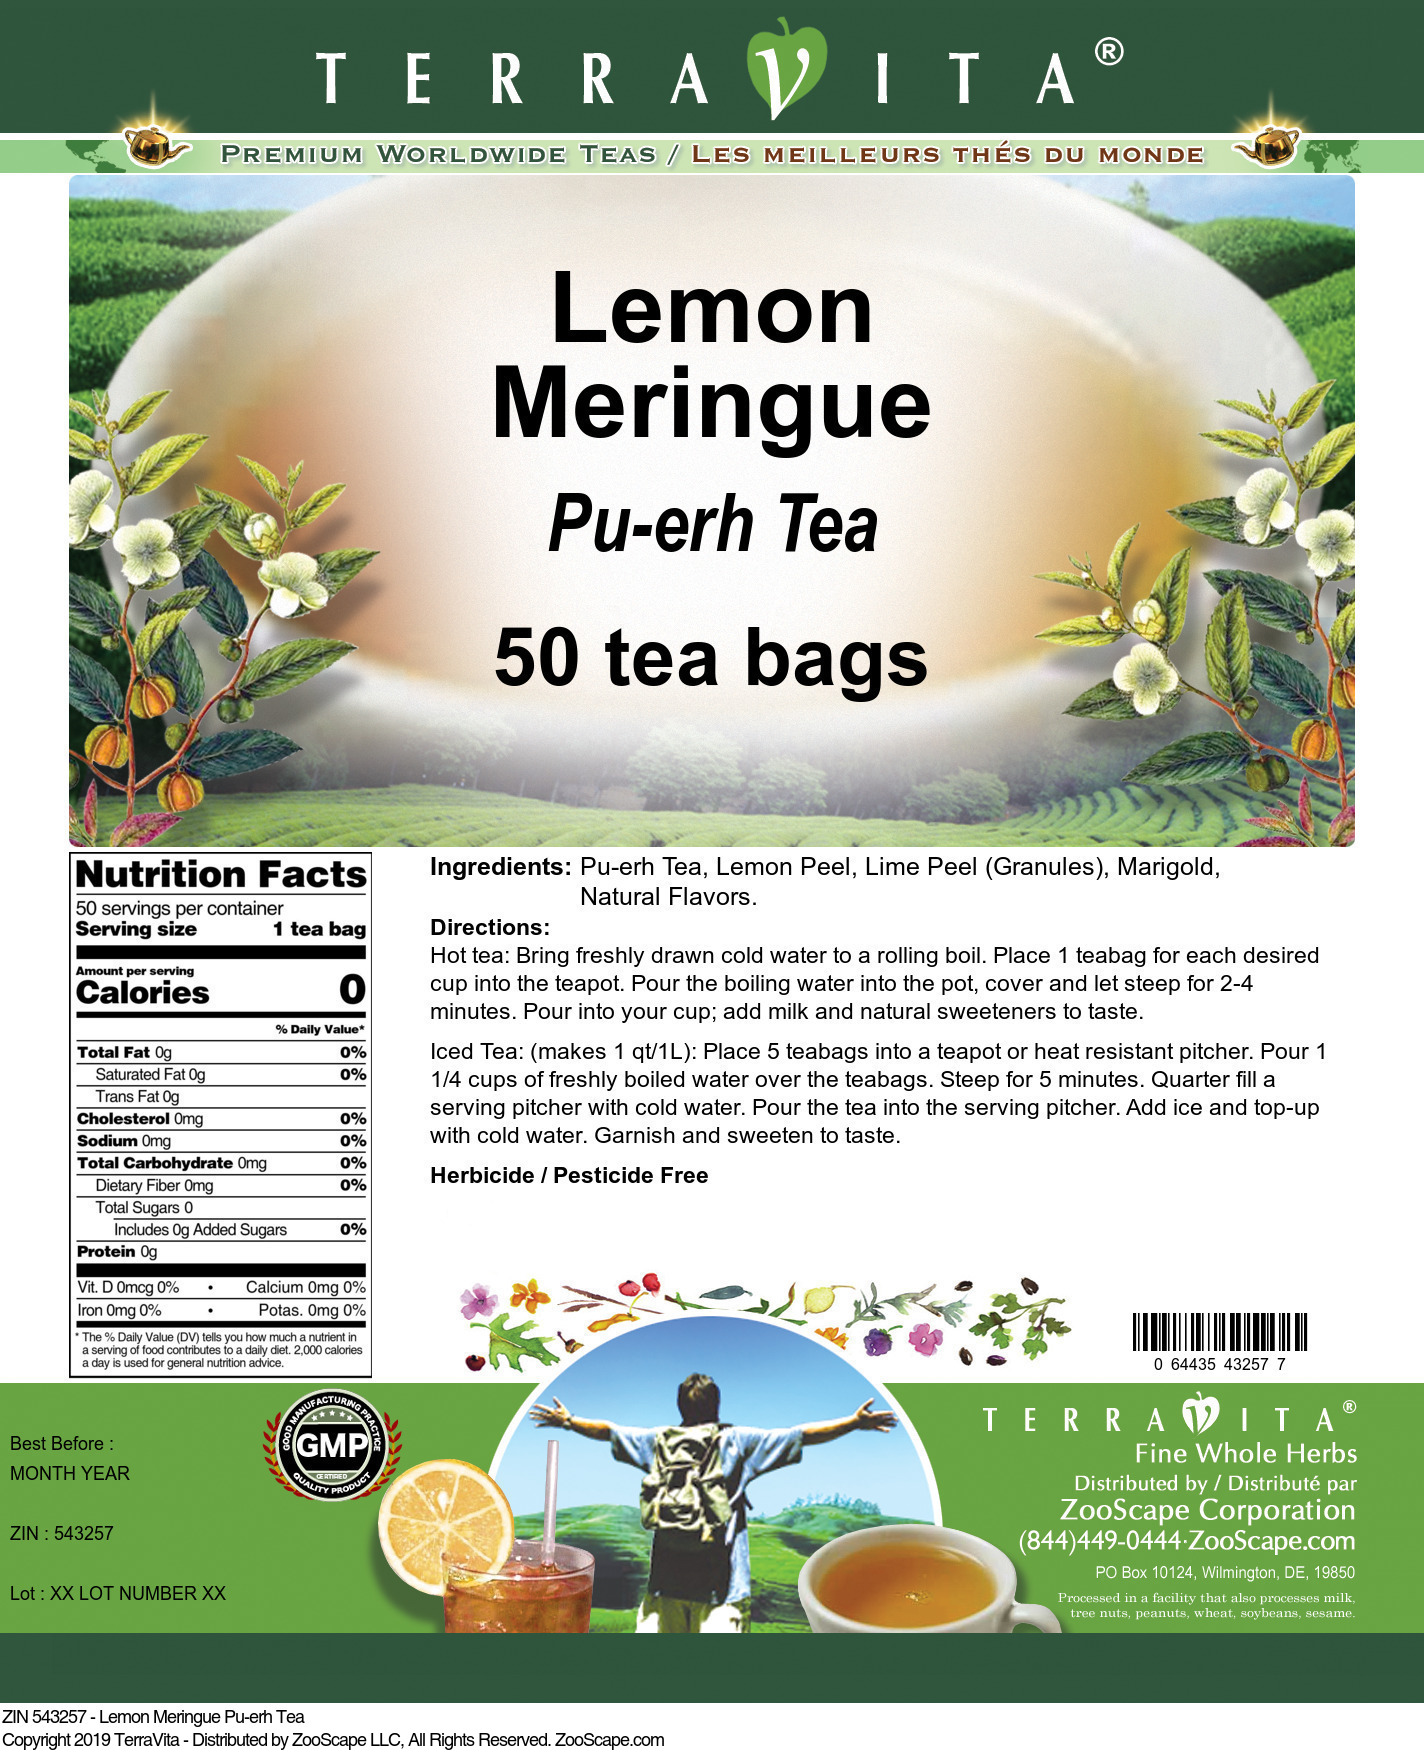 Lemon Meringue Pu-erh Tea